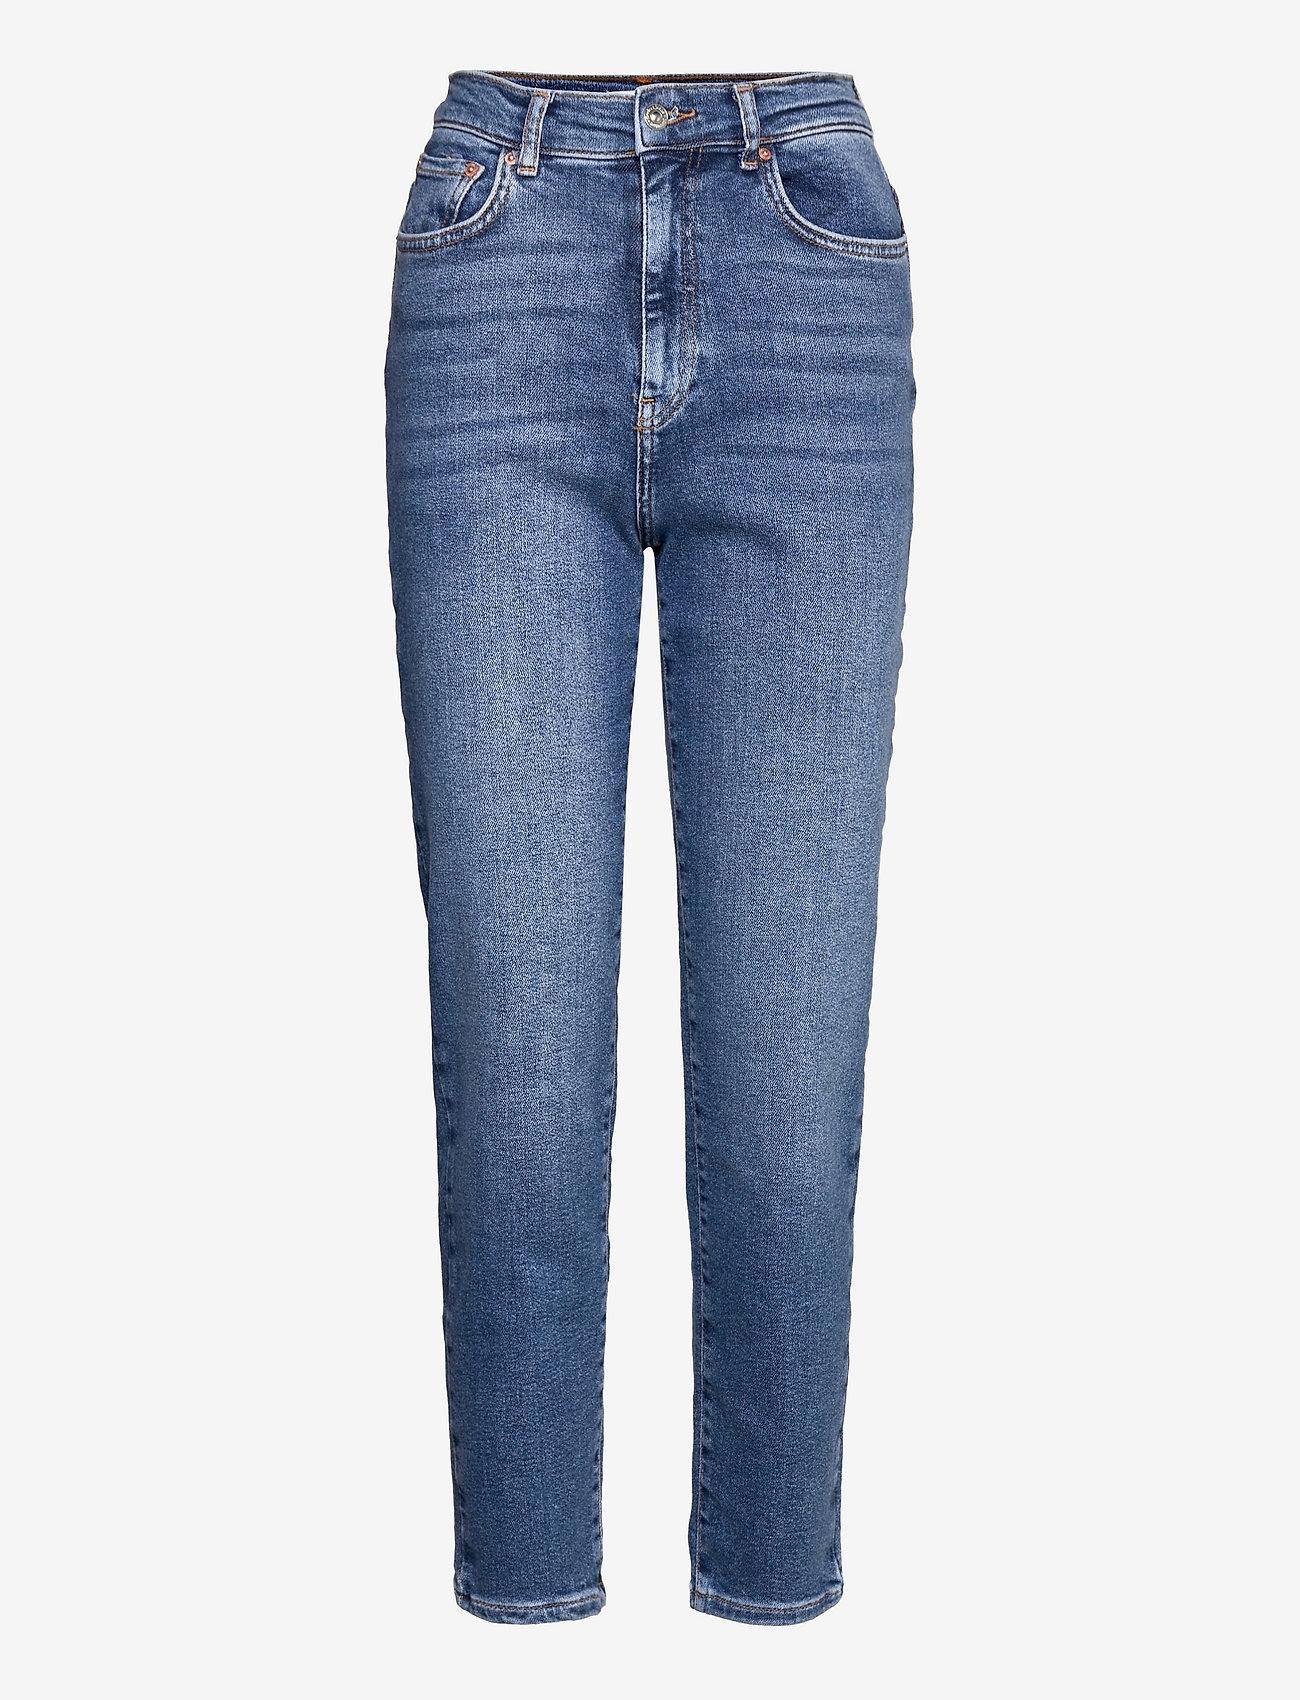 Gina Tricot - Comfy mom jeans - mom jeans - skyline blue (5062) - 0